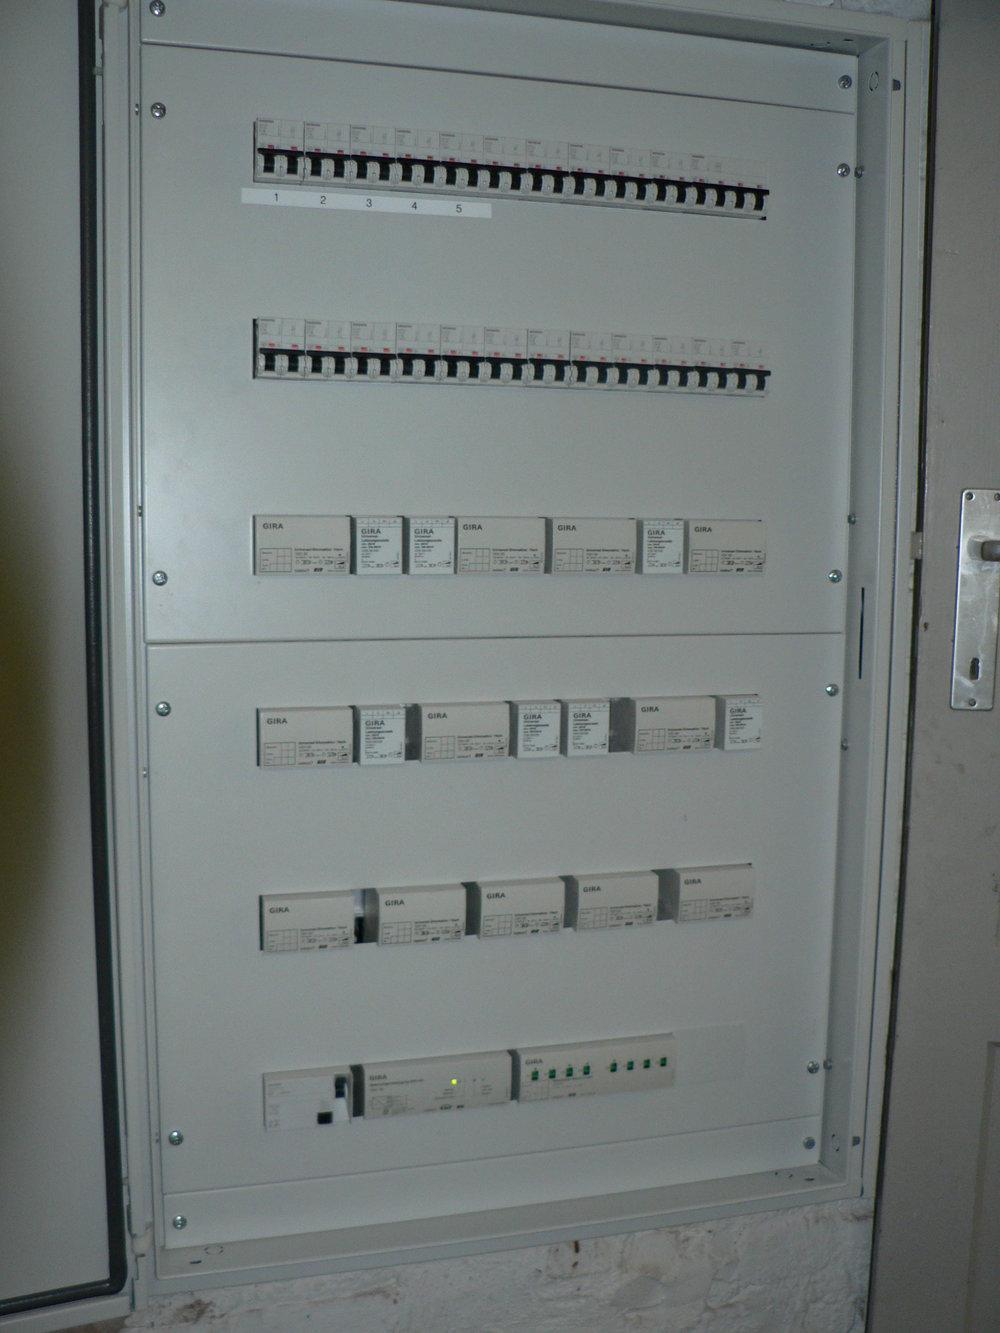 P1020428.JPG